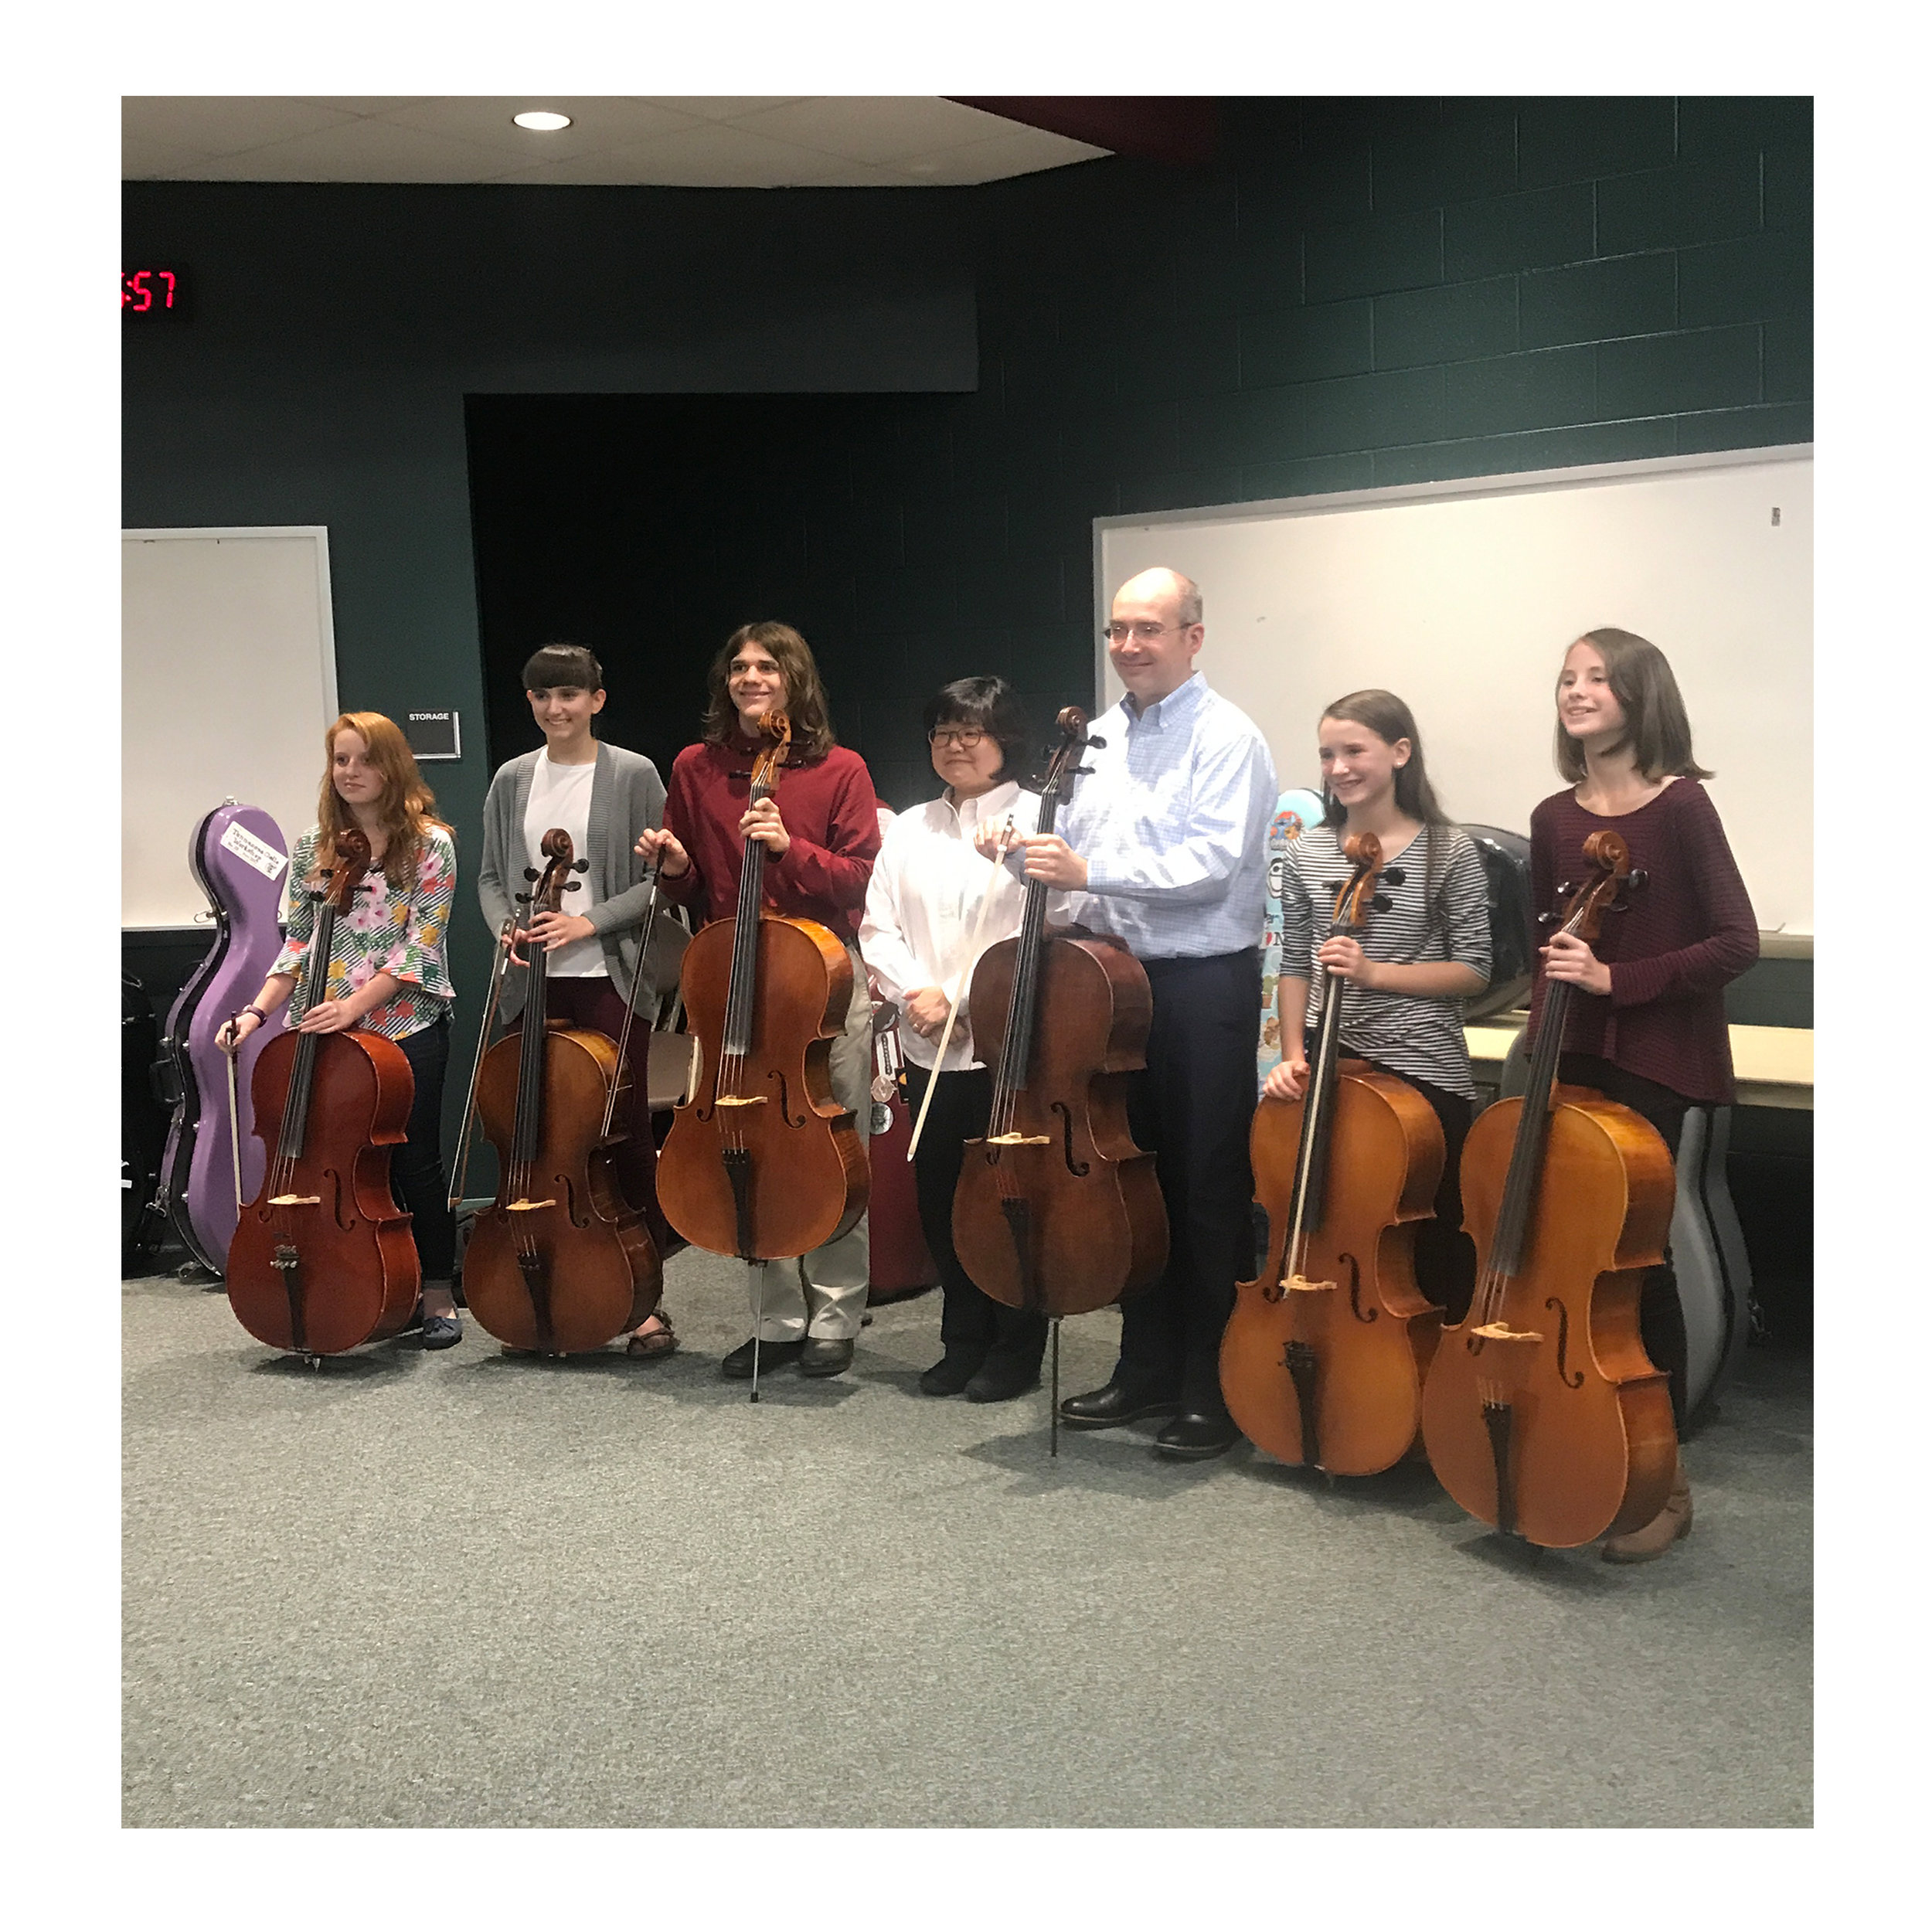 The Suzuki Method - A Comparison of Suzuki and Traditional Methods in Music Education